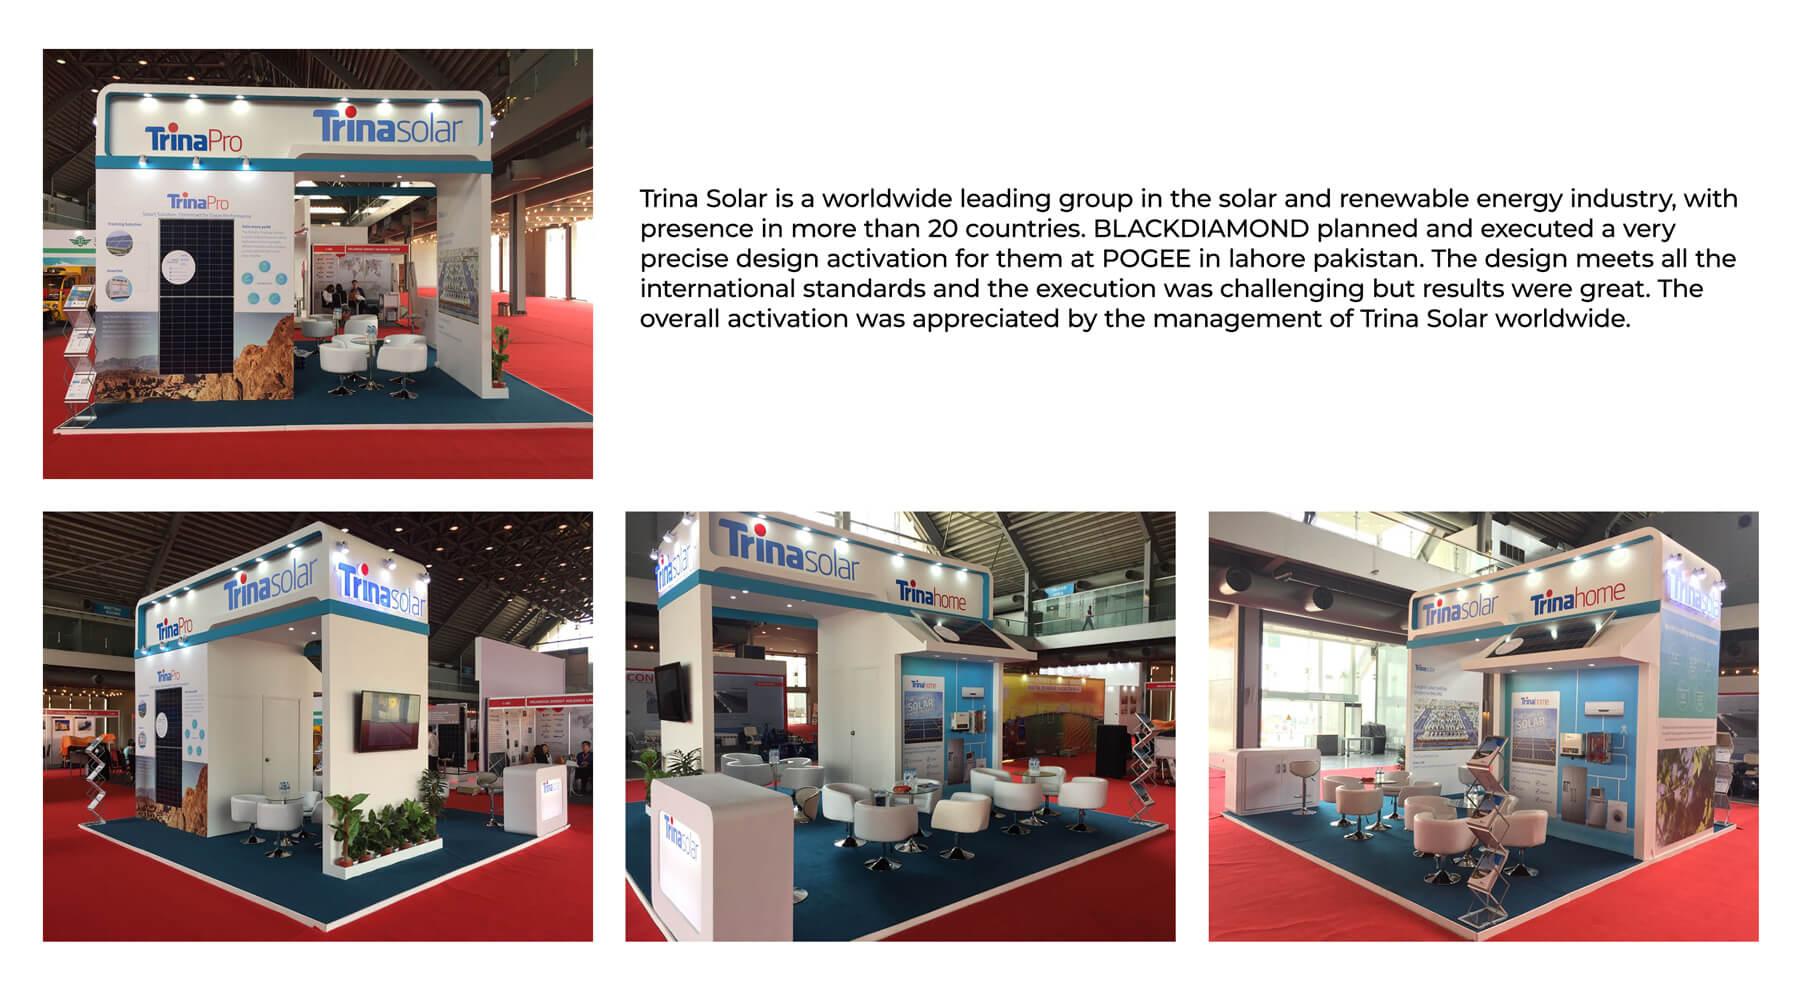 Trina Solar Brand Exhibition